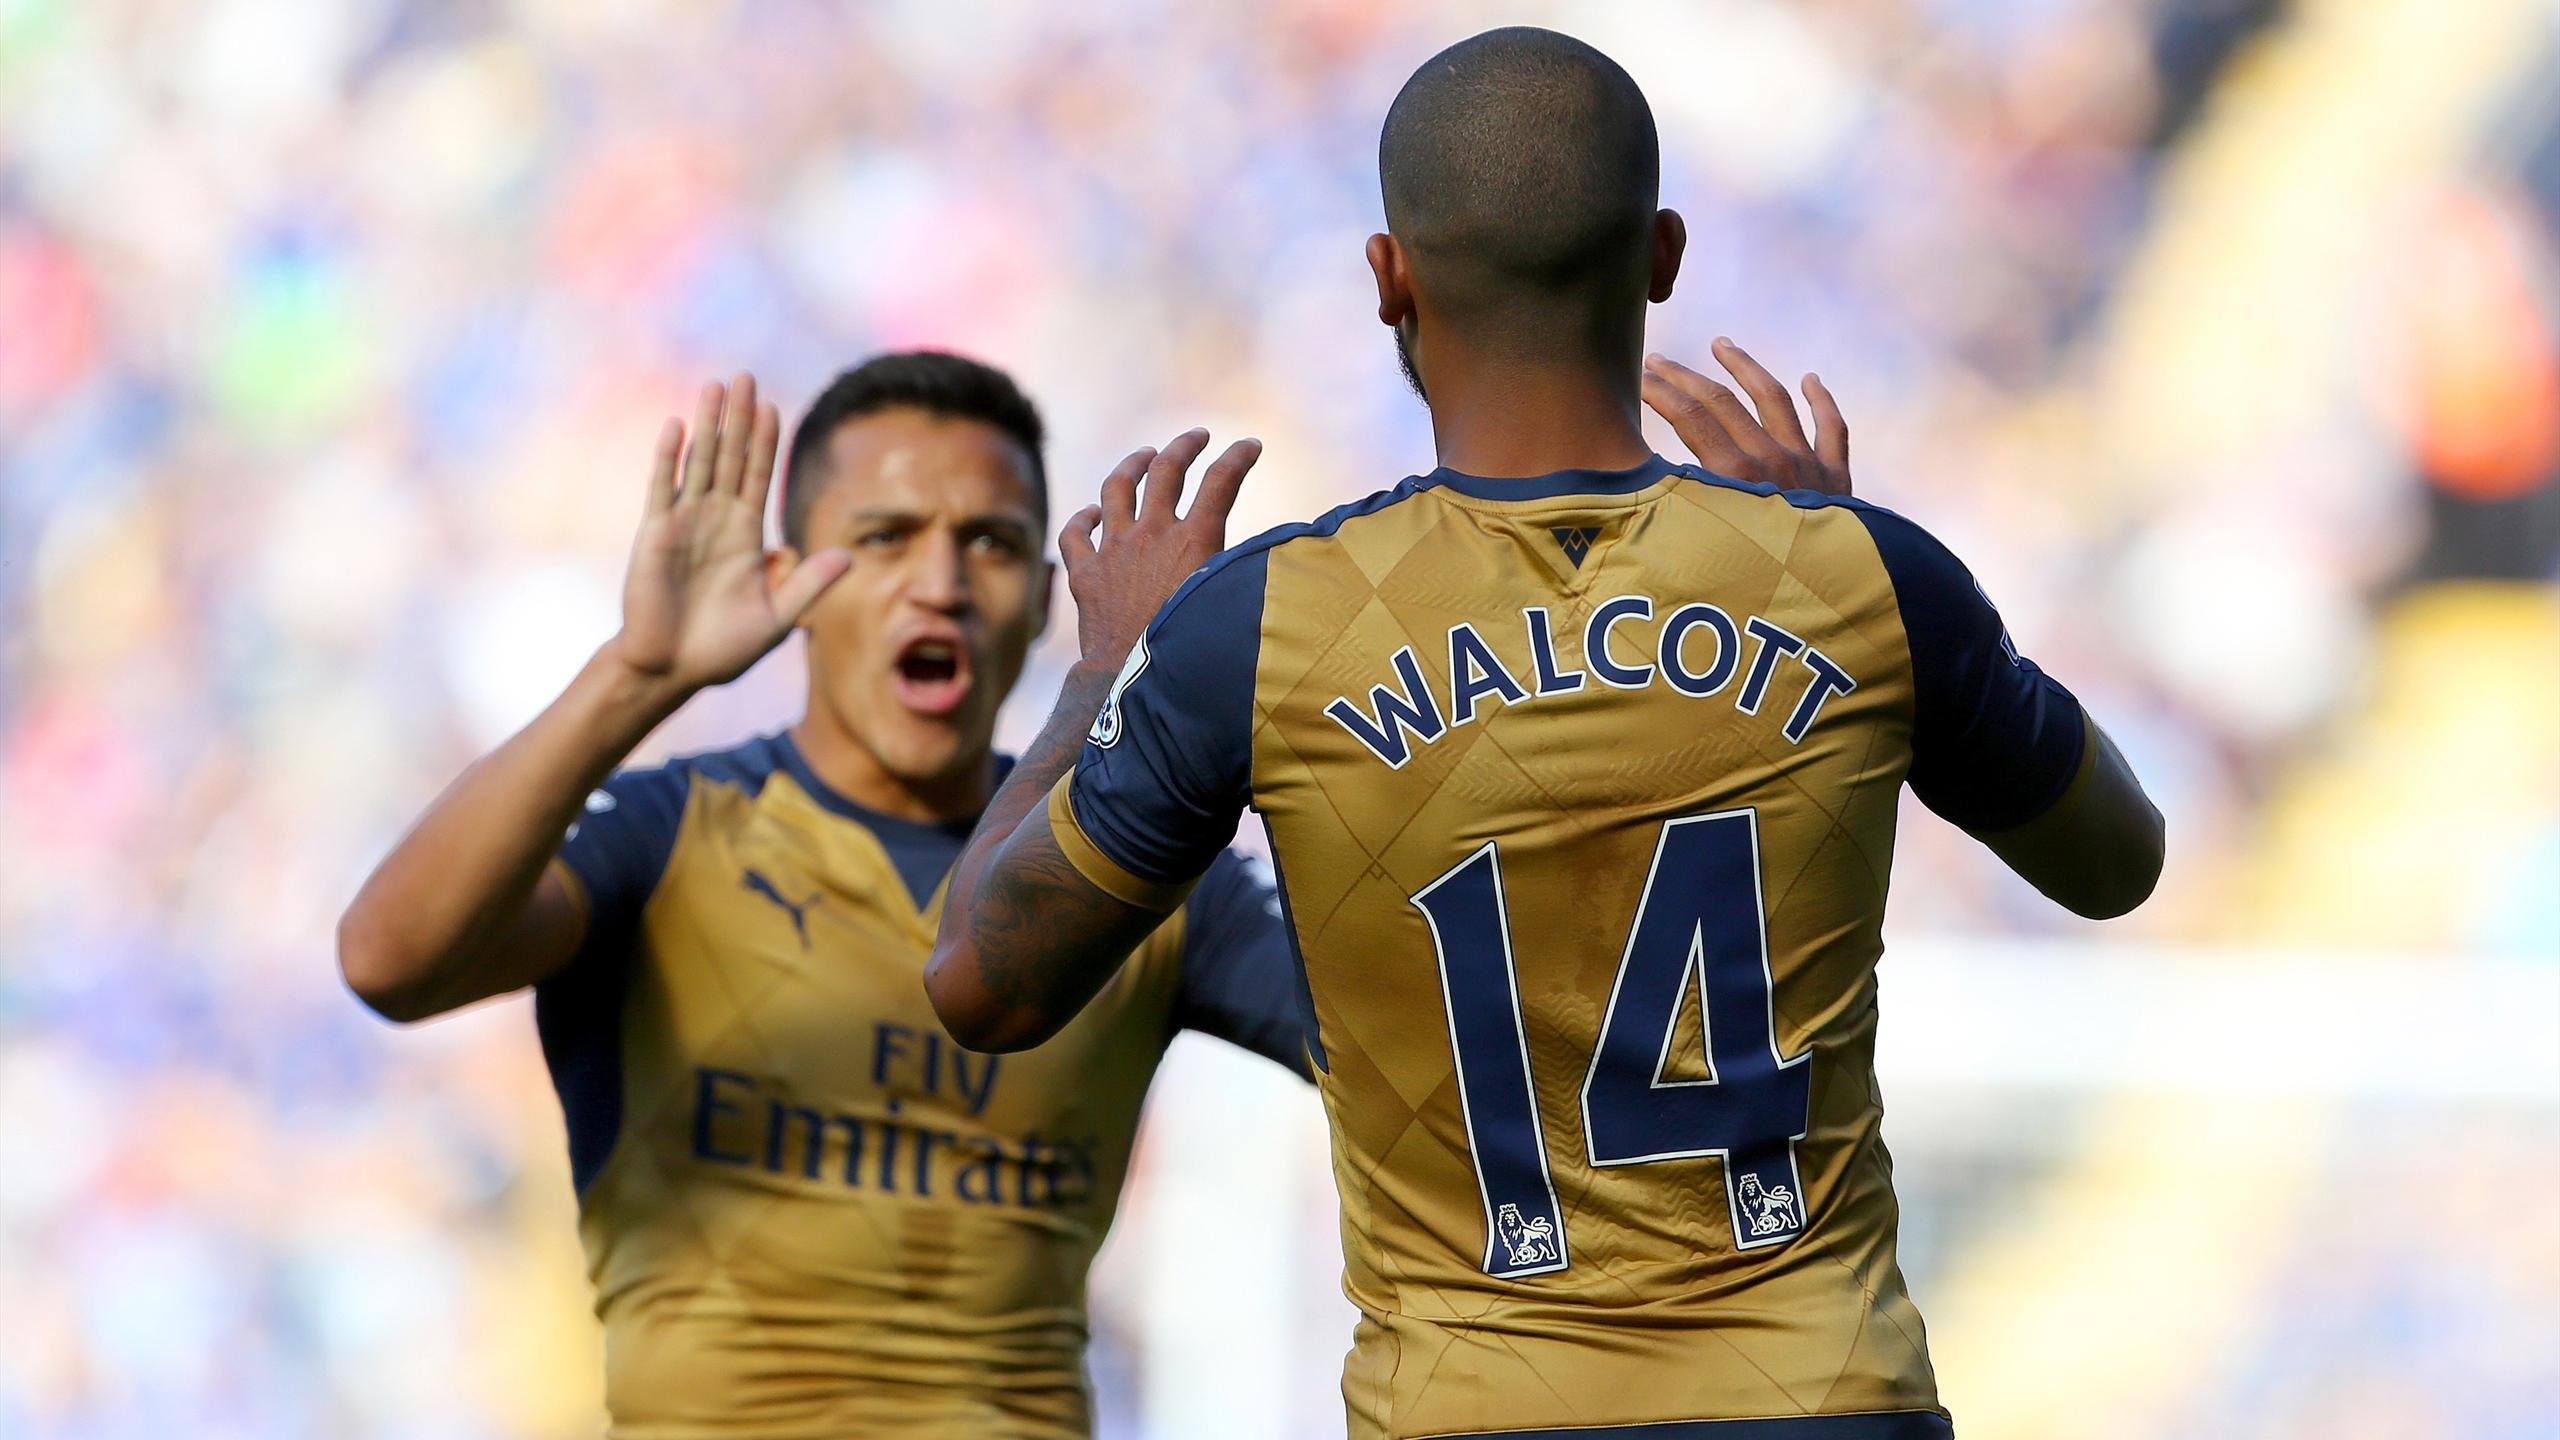 Arsenal's English striker Theo Walcott (R) celebrates with Arsenal's Chilean striker Alexis Sanchez